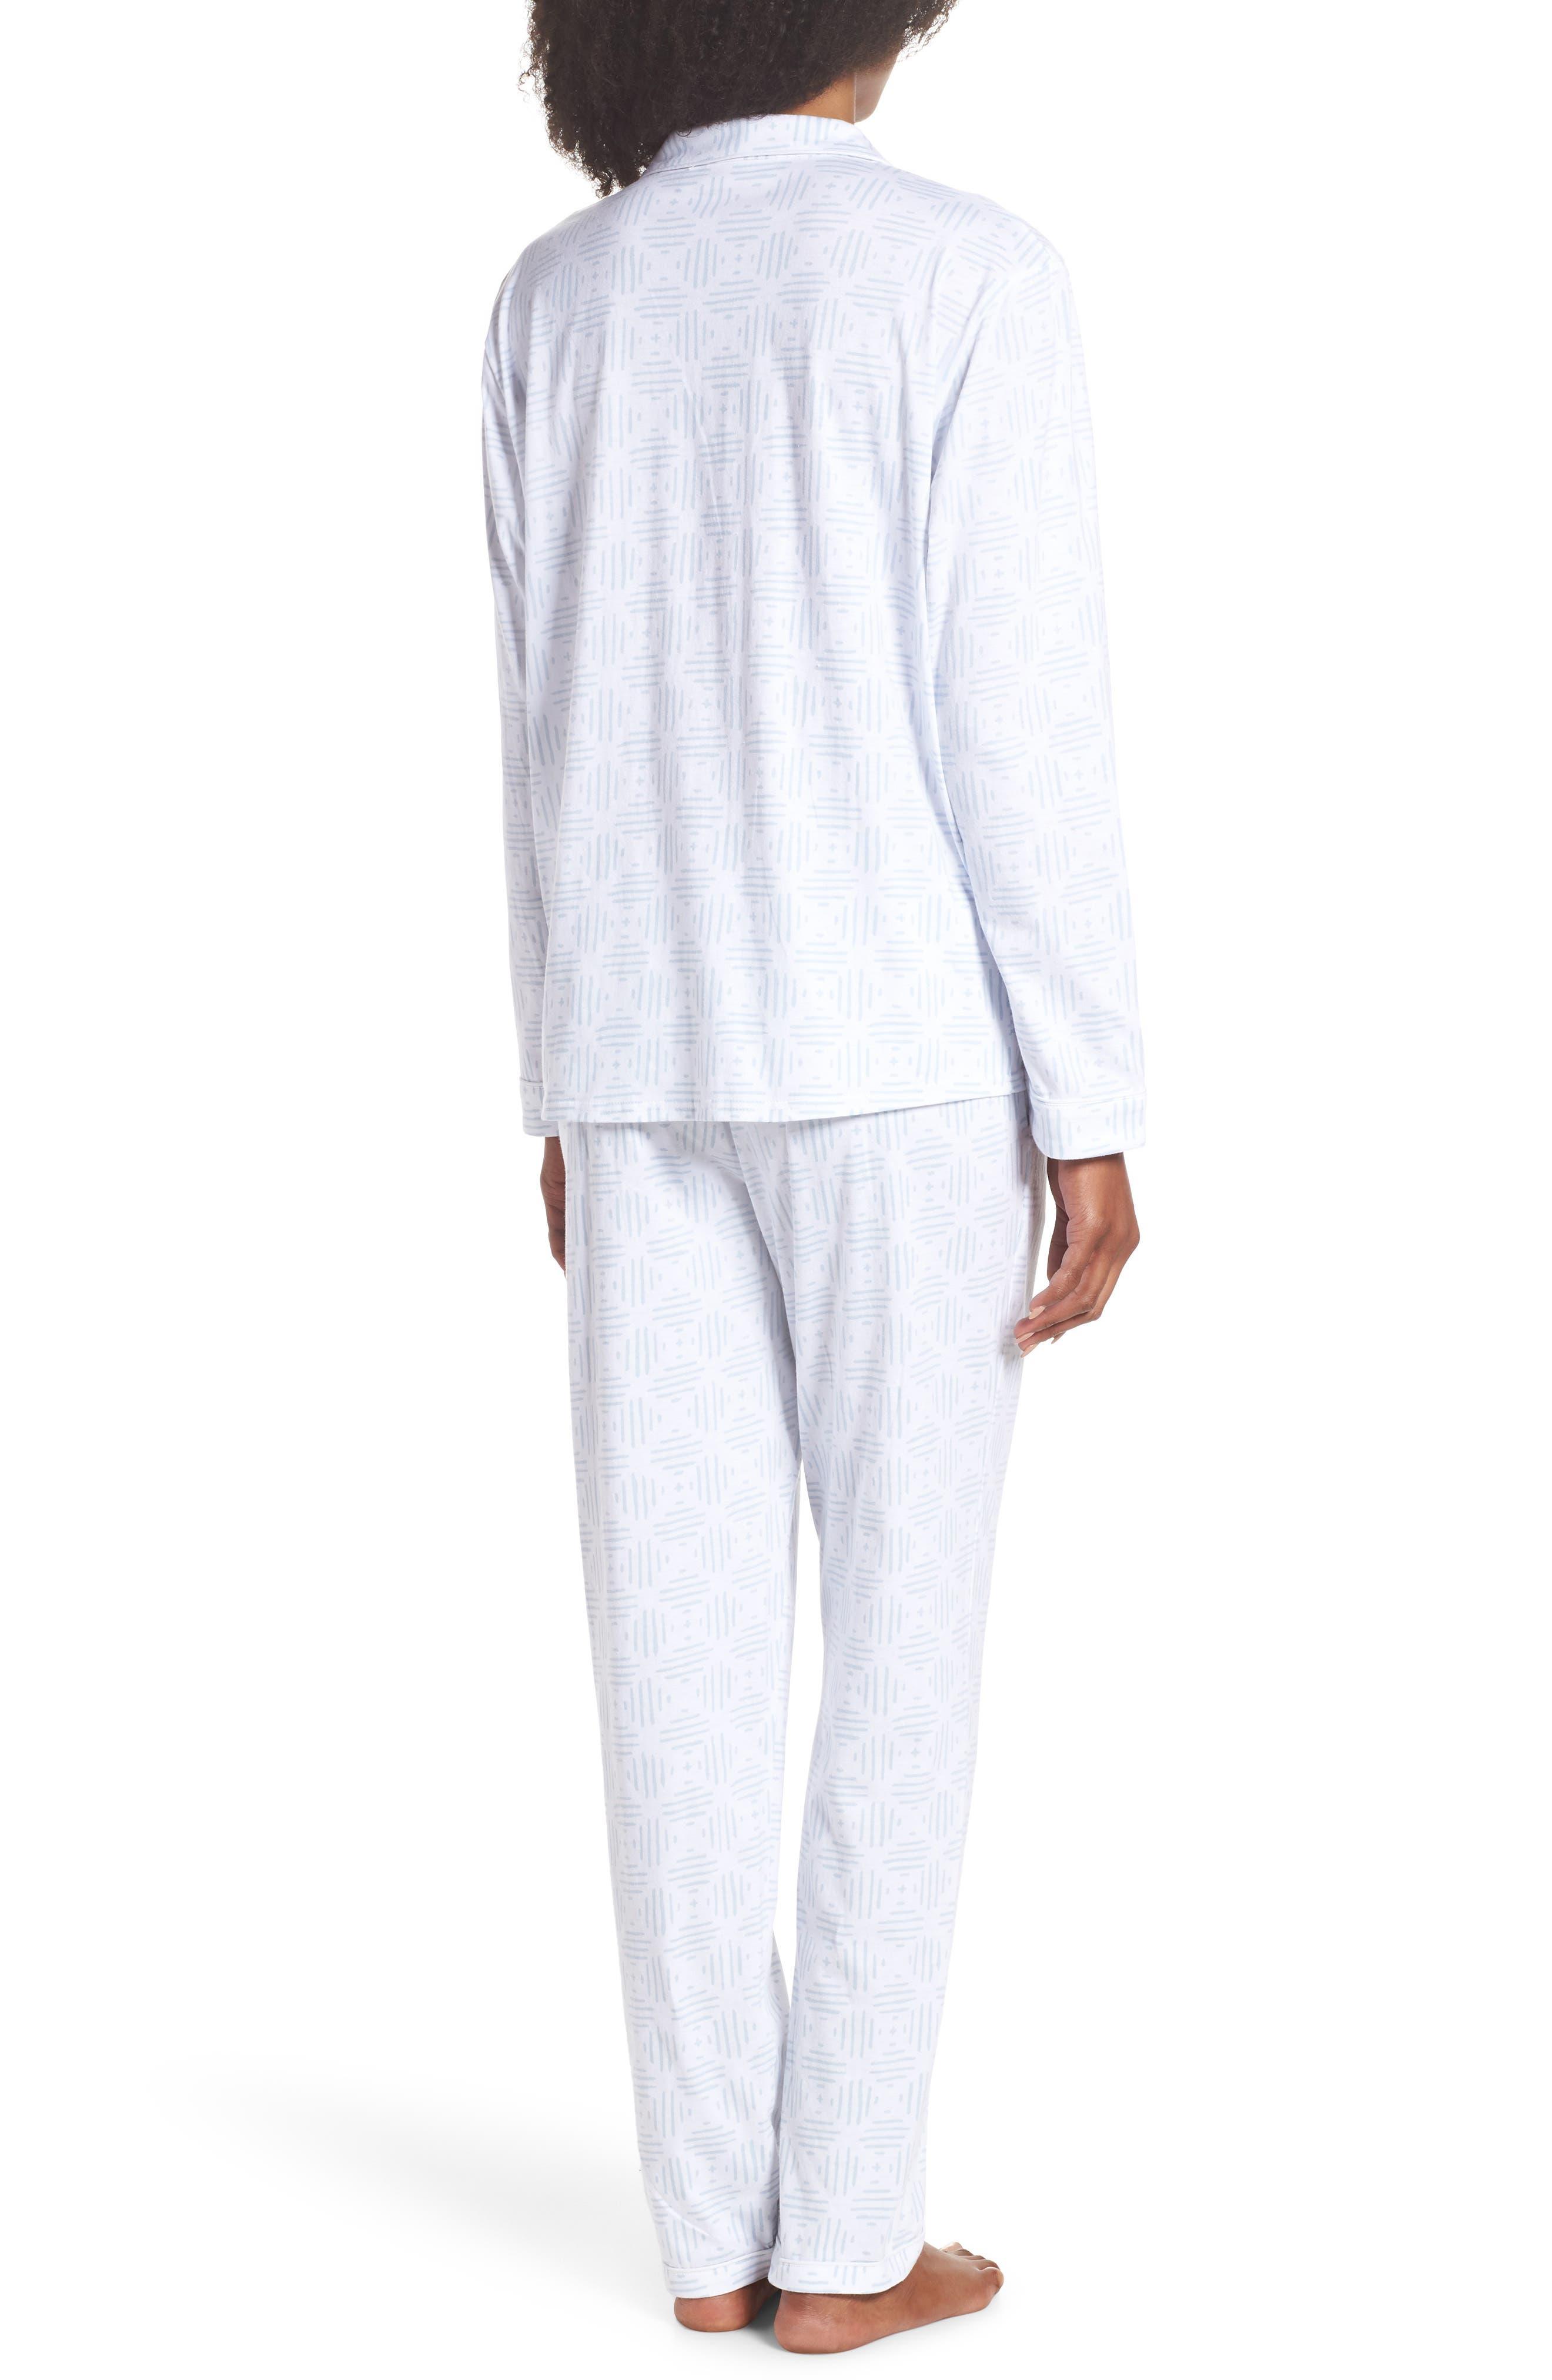 Moroccan Tile Pajamas,                             Alternate thumbnail 2, color,                             100